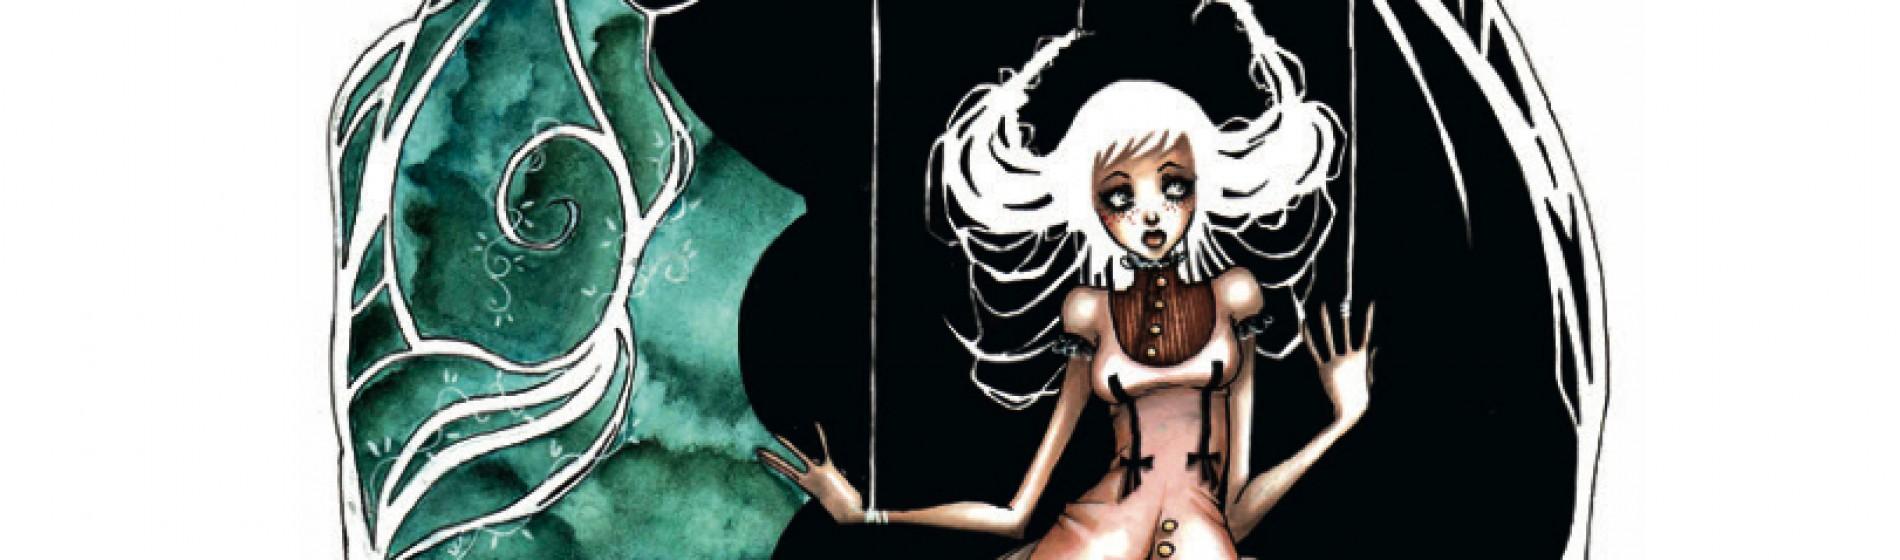 Planet Goth _ COVER ART jpg